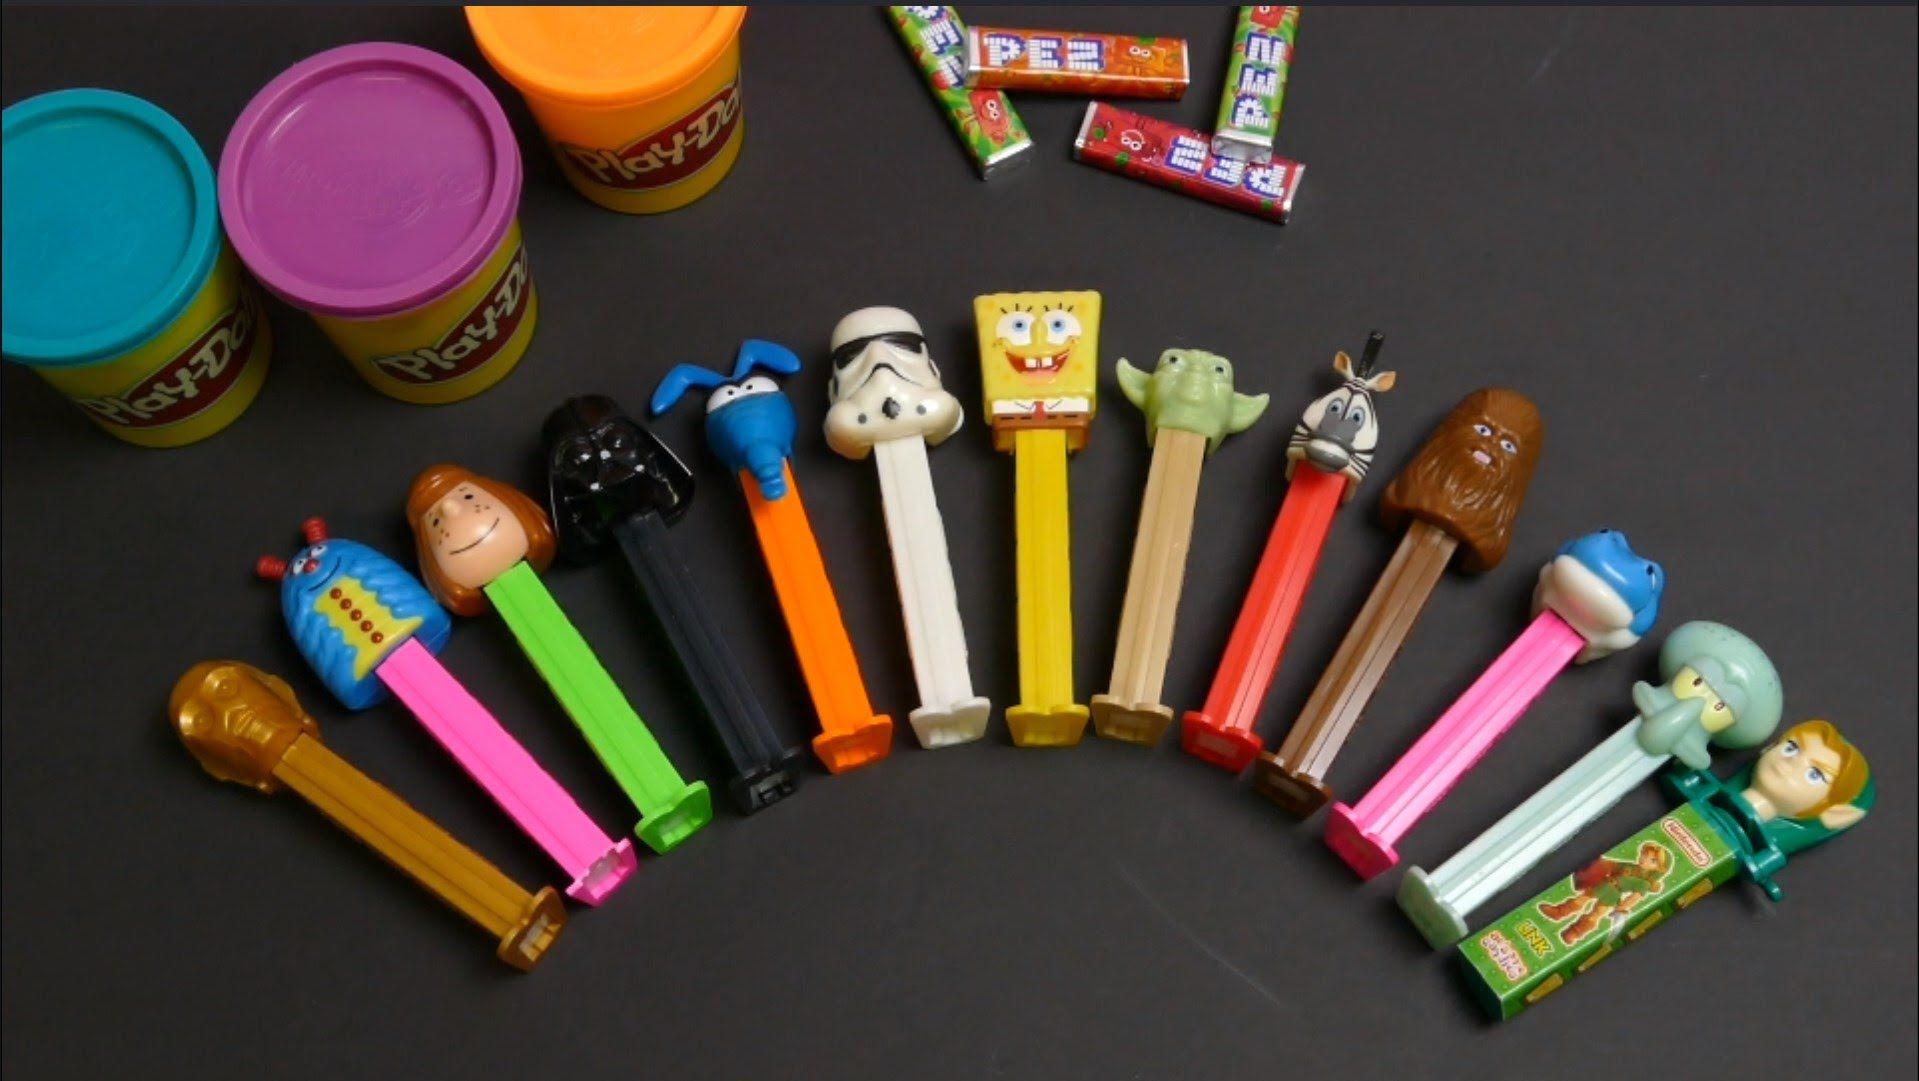 Star Wars Chubaka, Yoda, Blue Elise, Stormtrooper PEZ Dispenser & Play-Doh